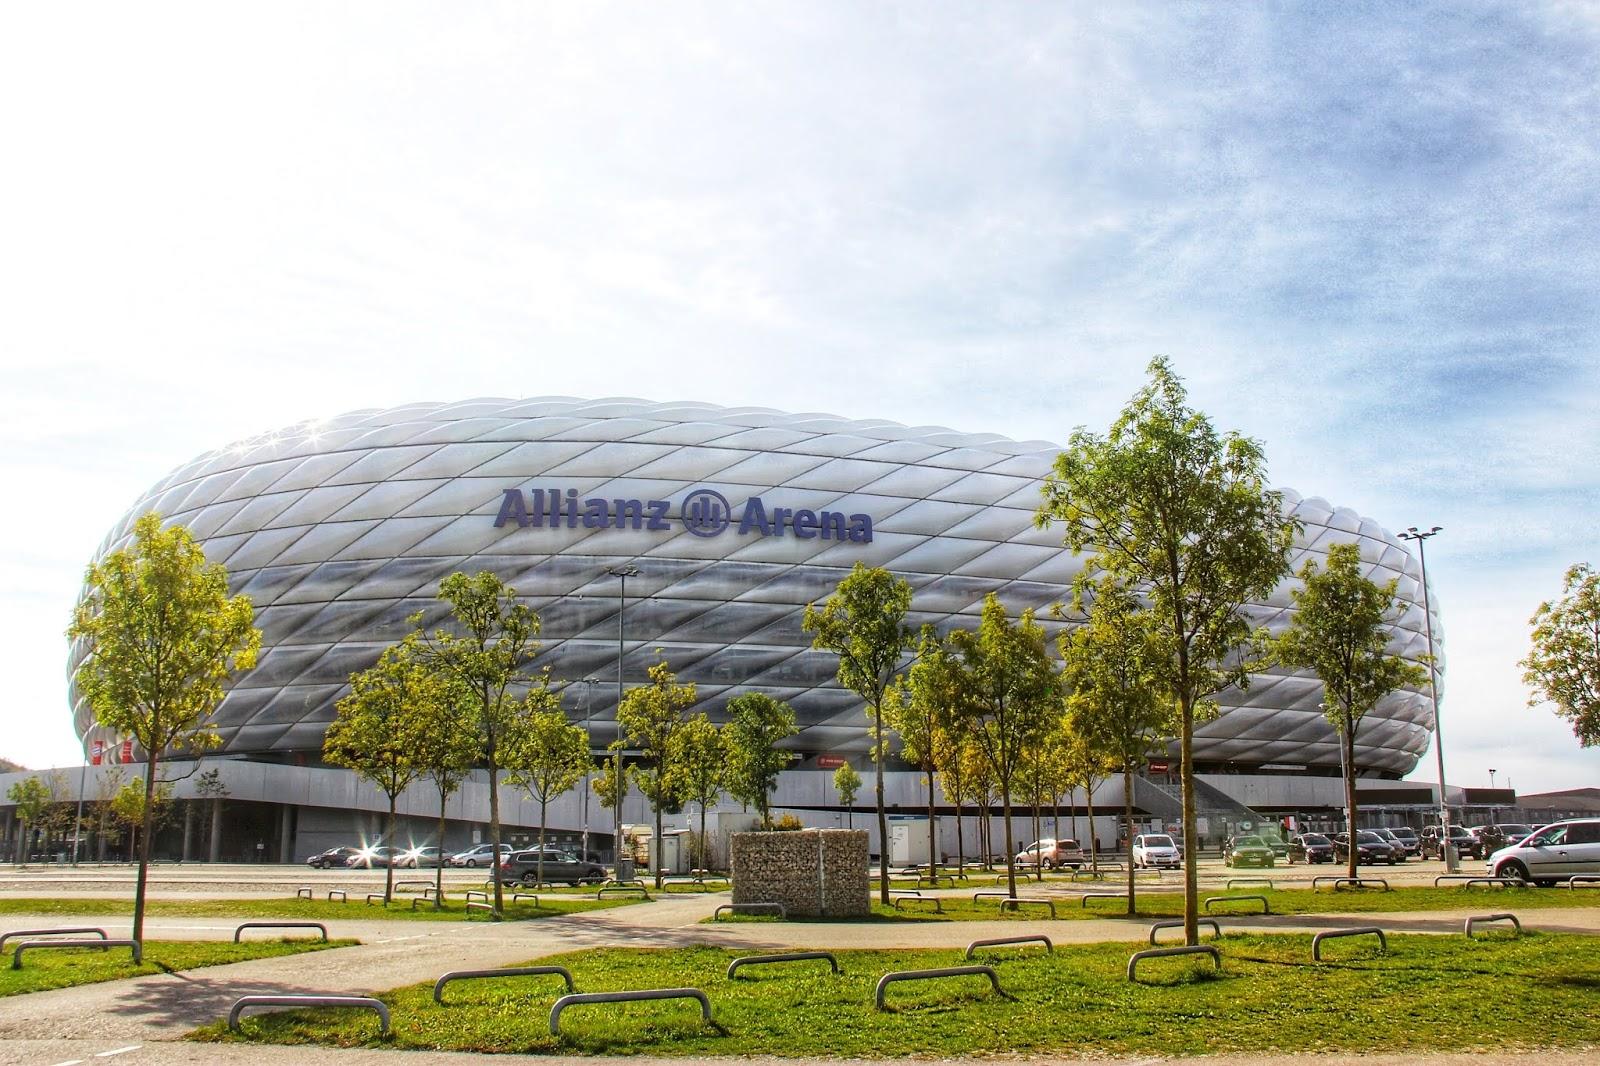 Allianz Arena at Munich, Germany 1